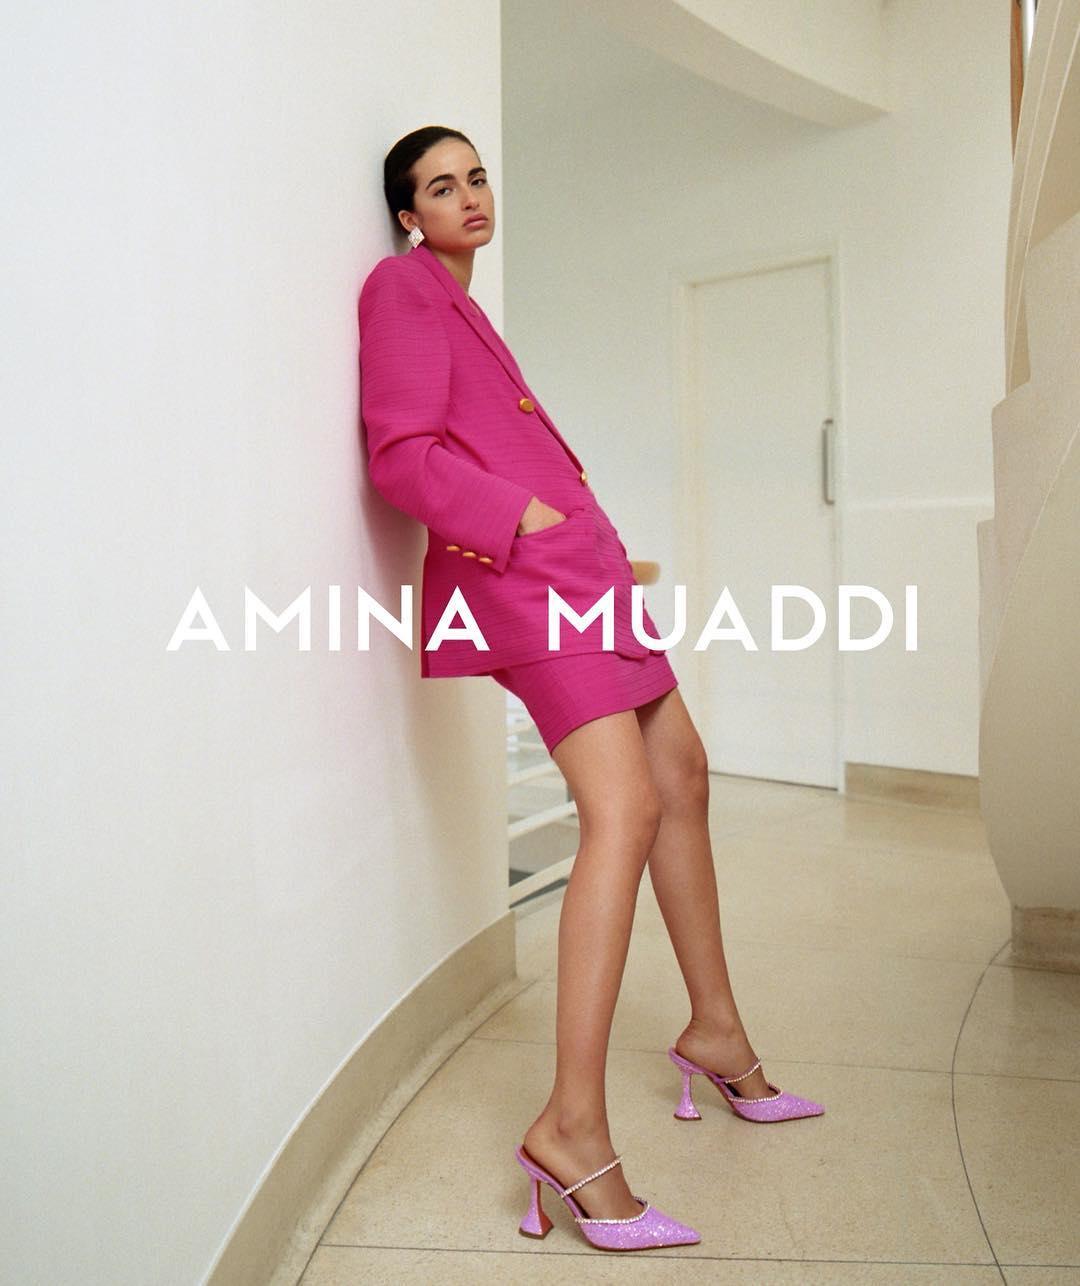 AMINA MUADDI THE NEW SHOE SENSATION